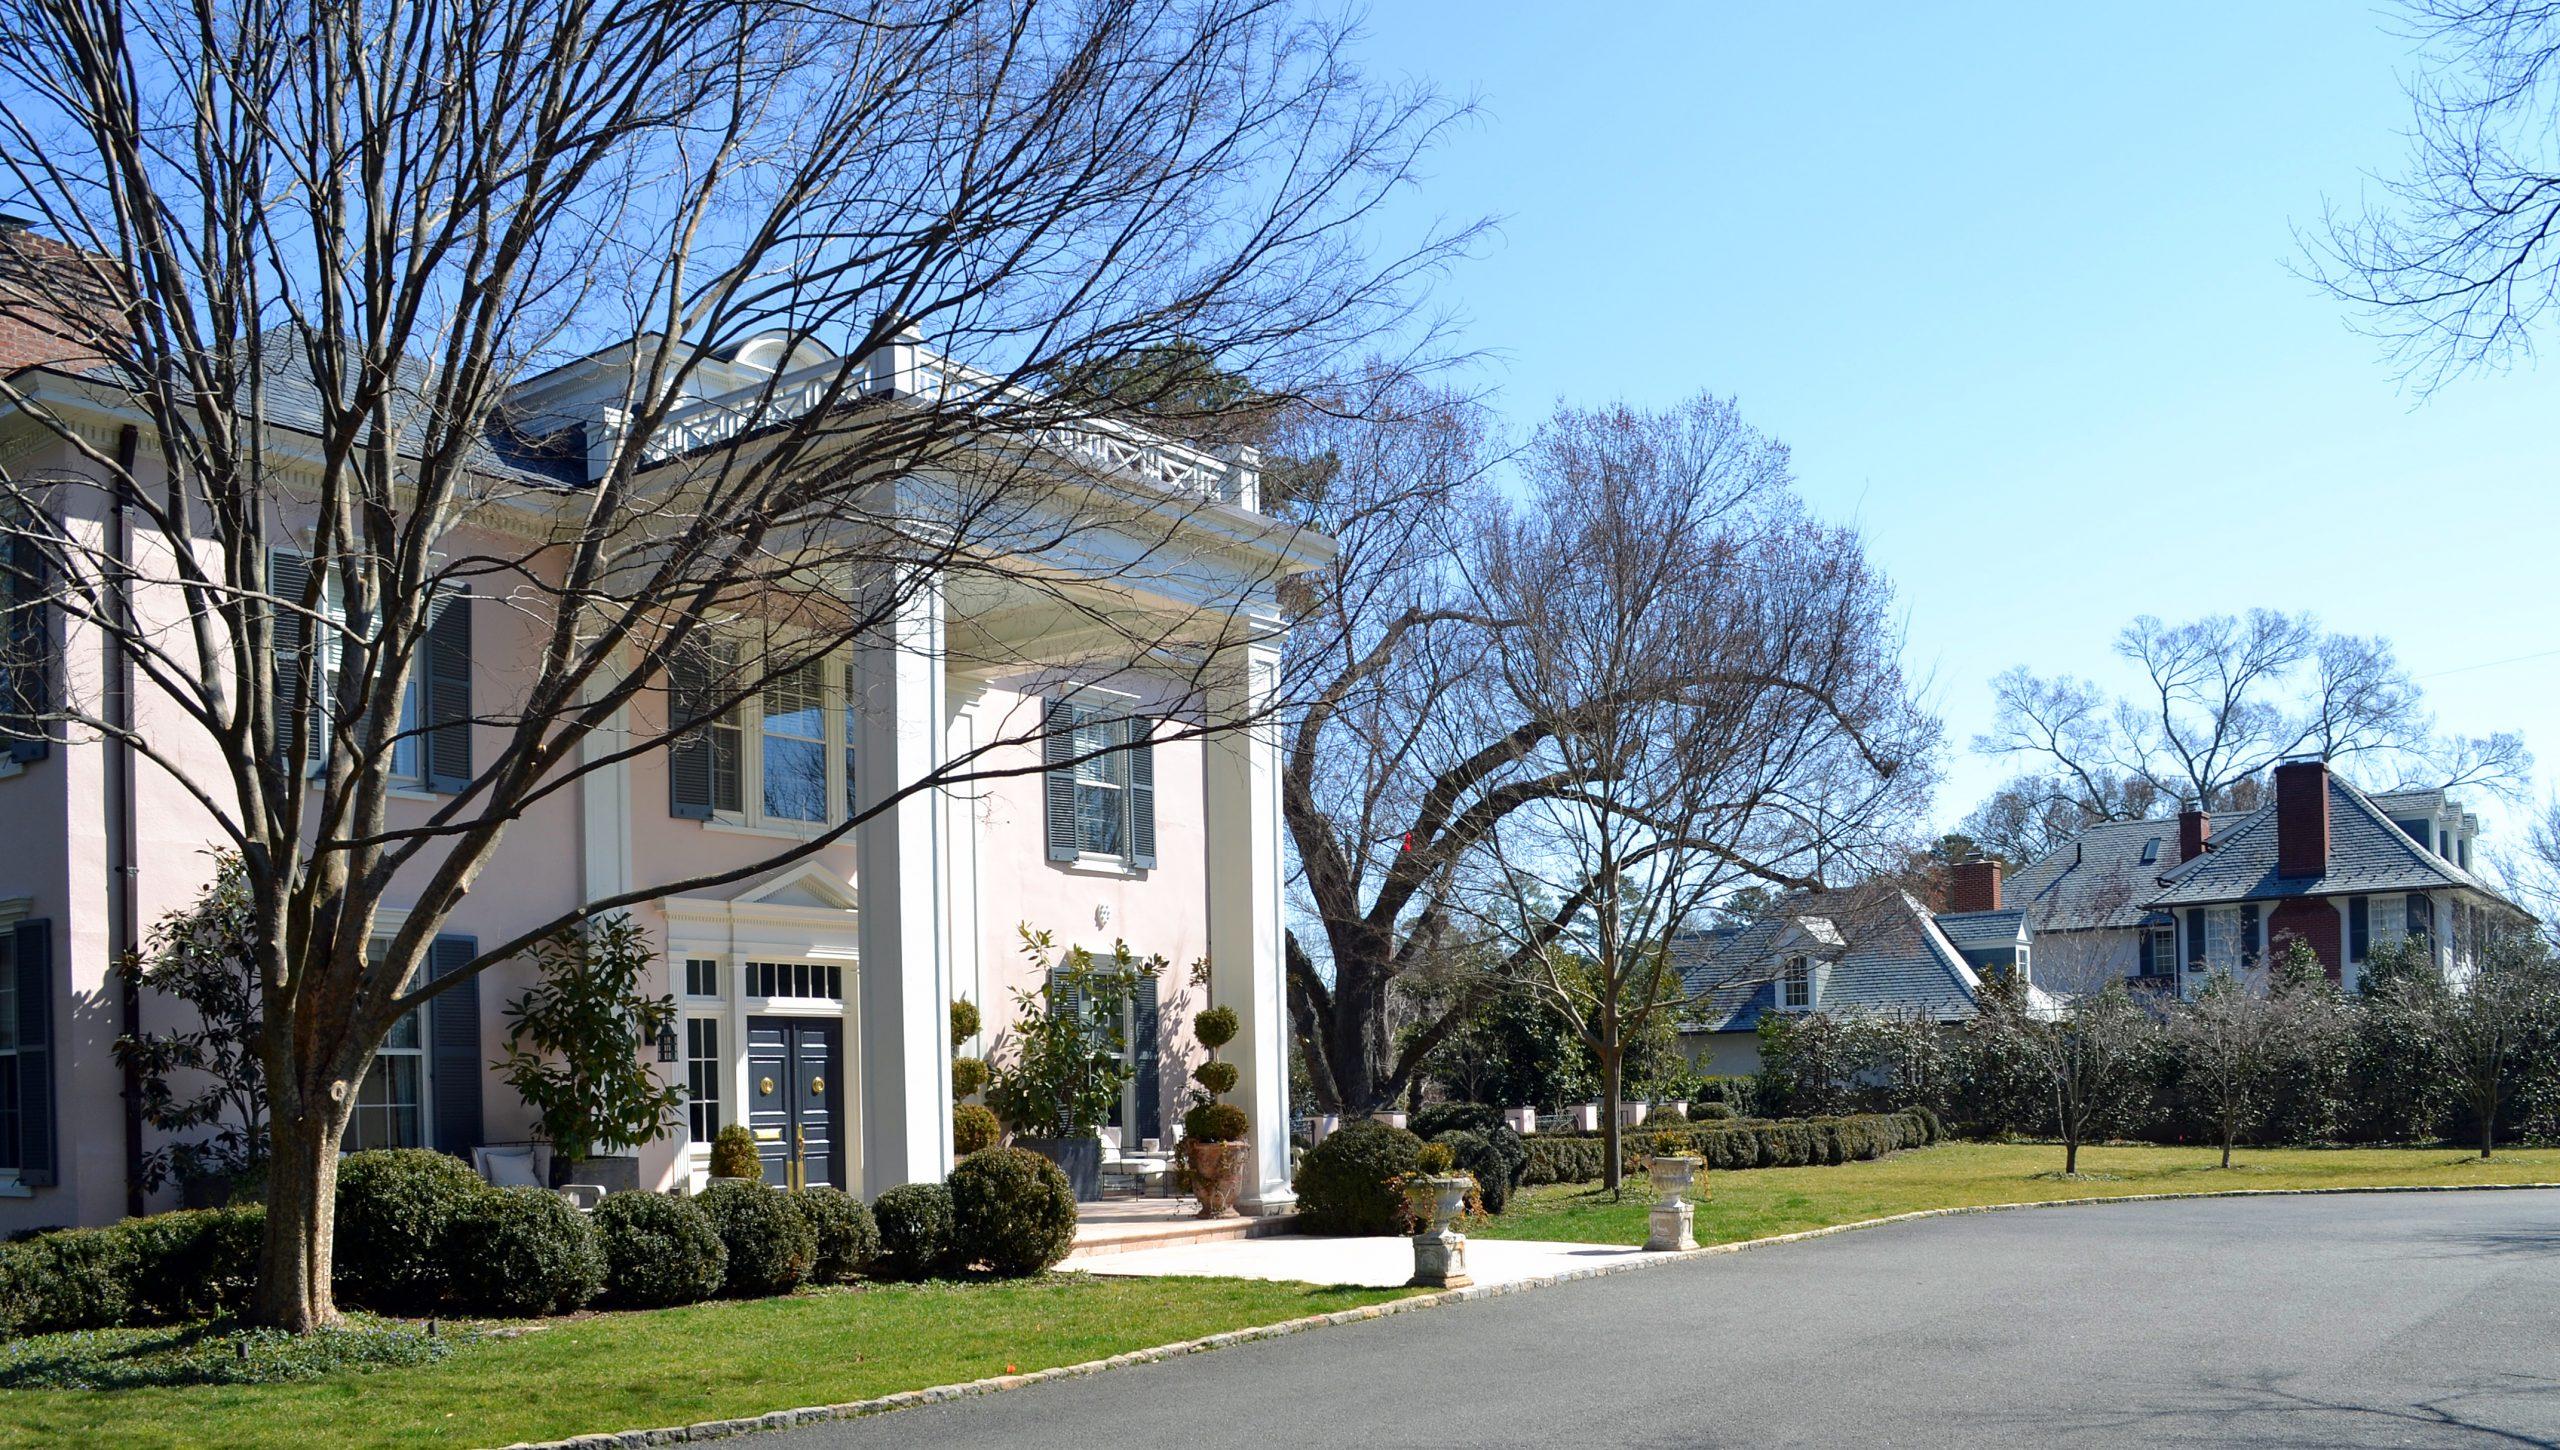 Three Chopt Road Historic District